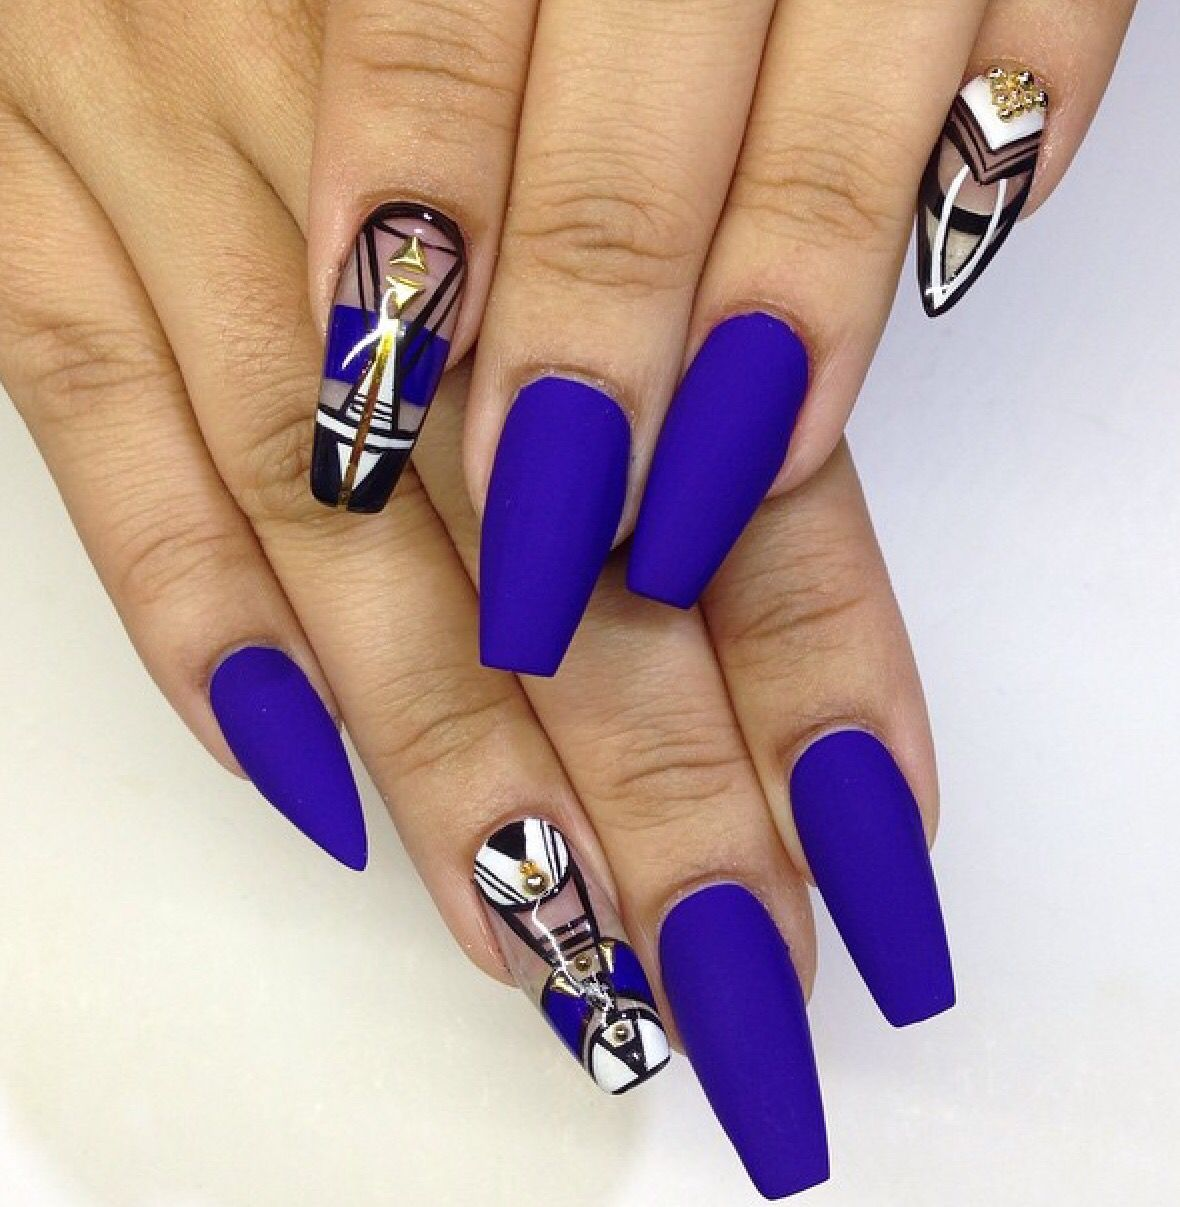 cobalt blue coffin nails with negative space designs. visit www